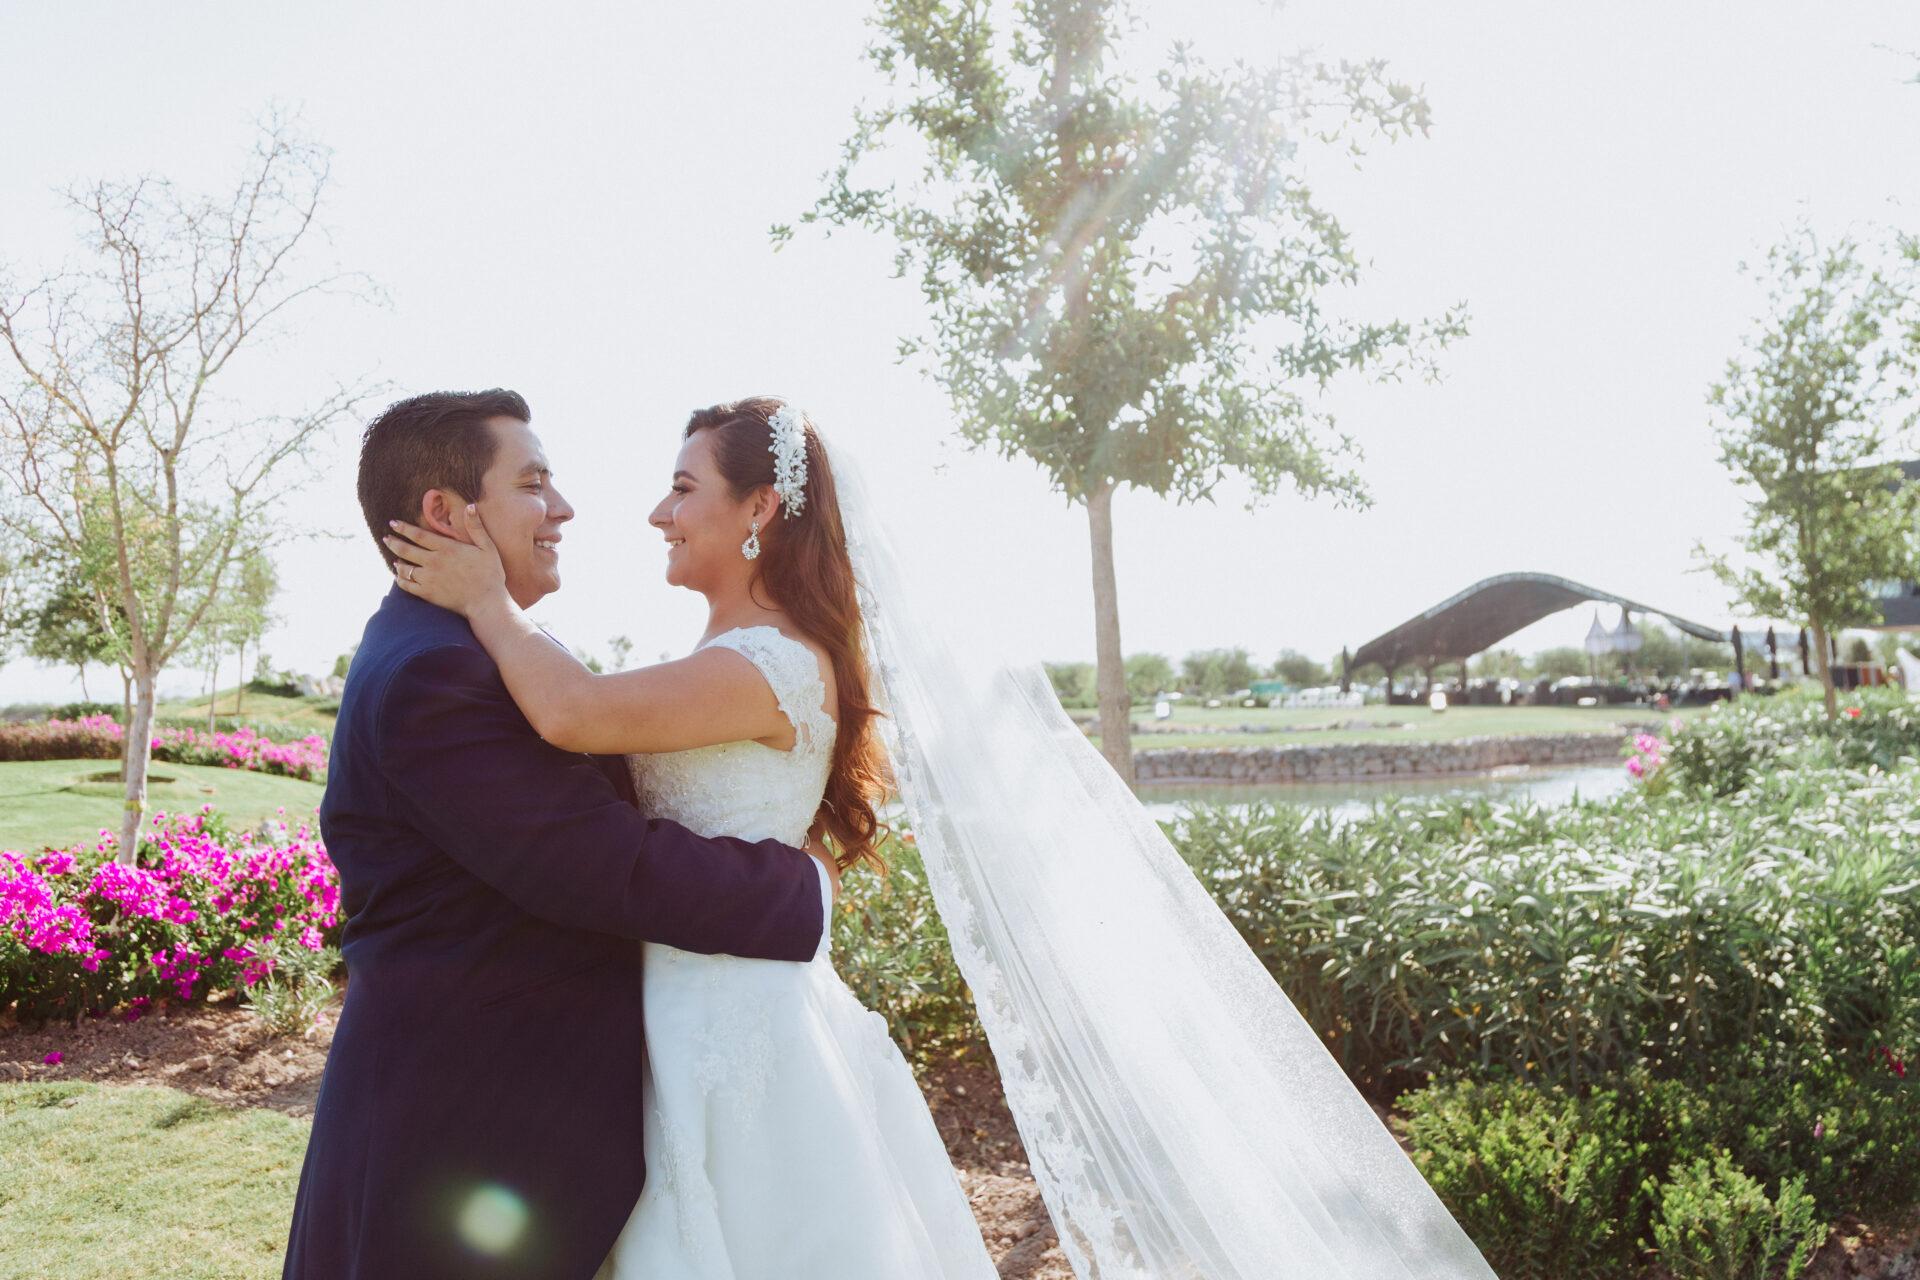 javier_noriega_fotografo_bodas_torreon_coahuila_zacatecas_wedding_photographer26a